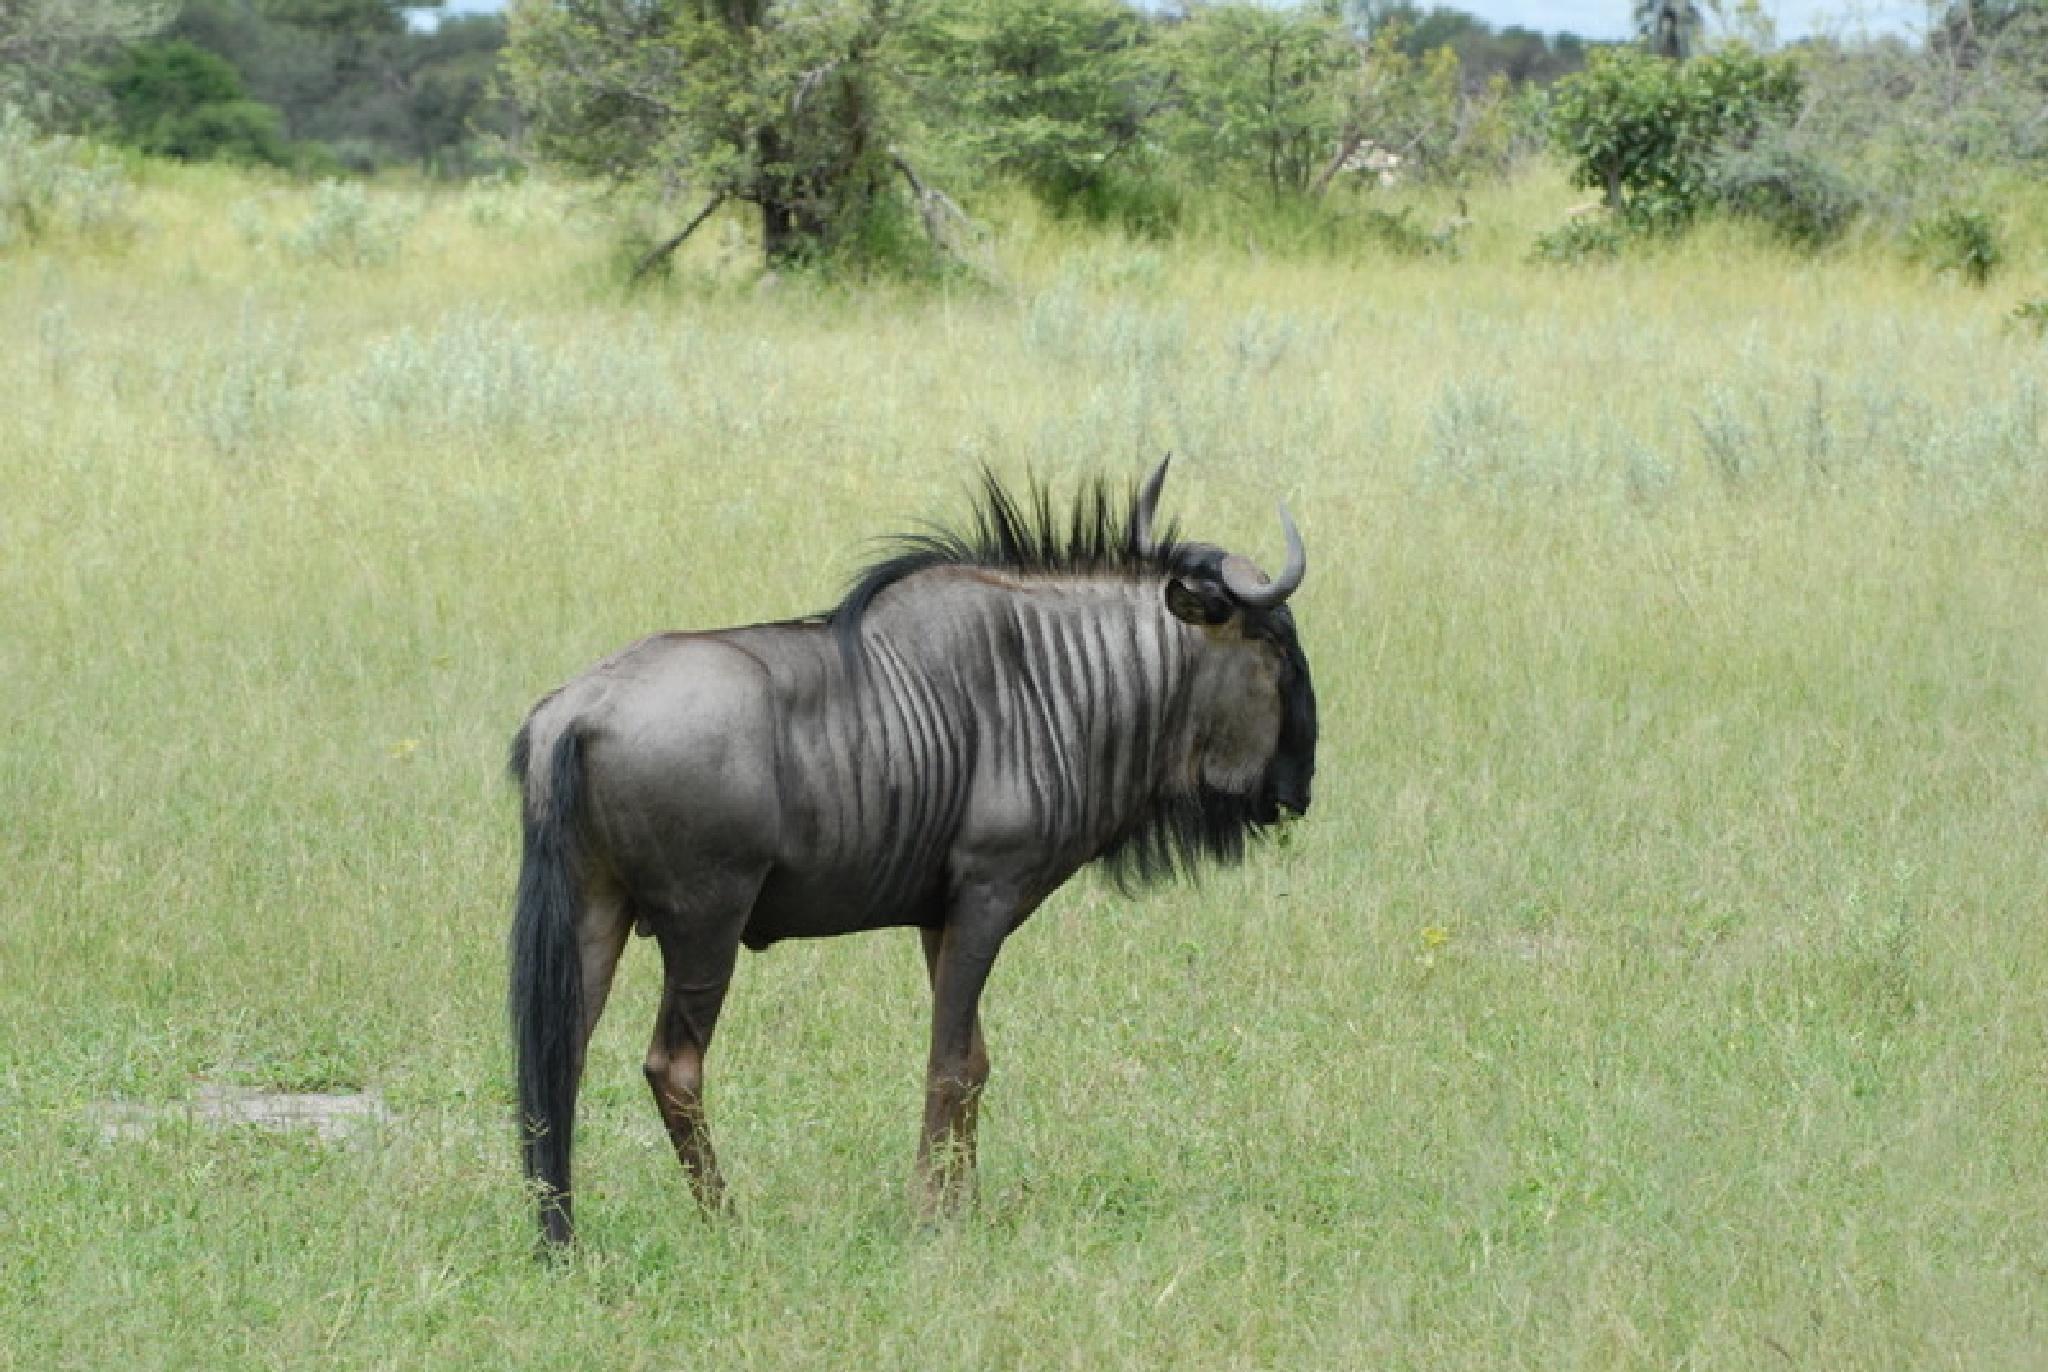 Wildebeest by vincy726